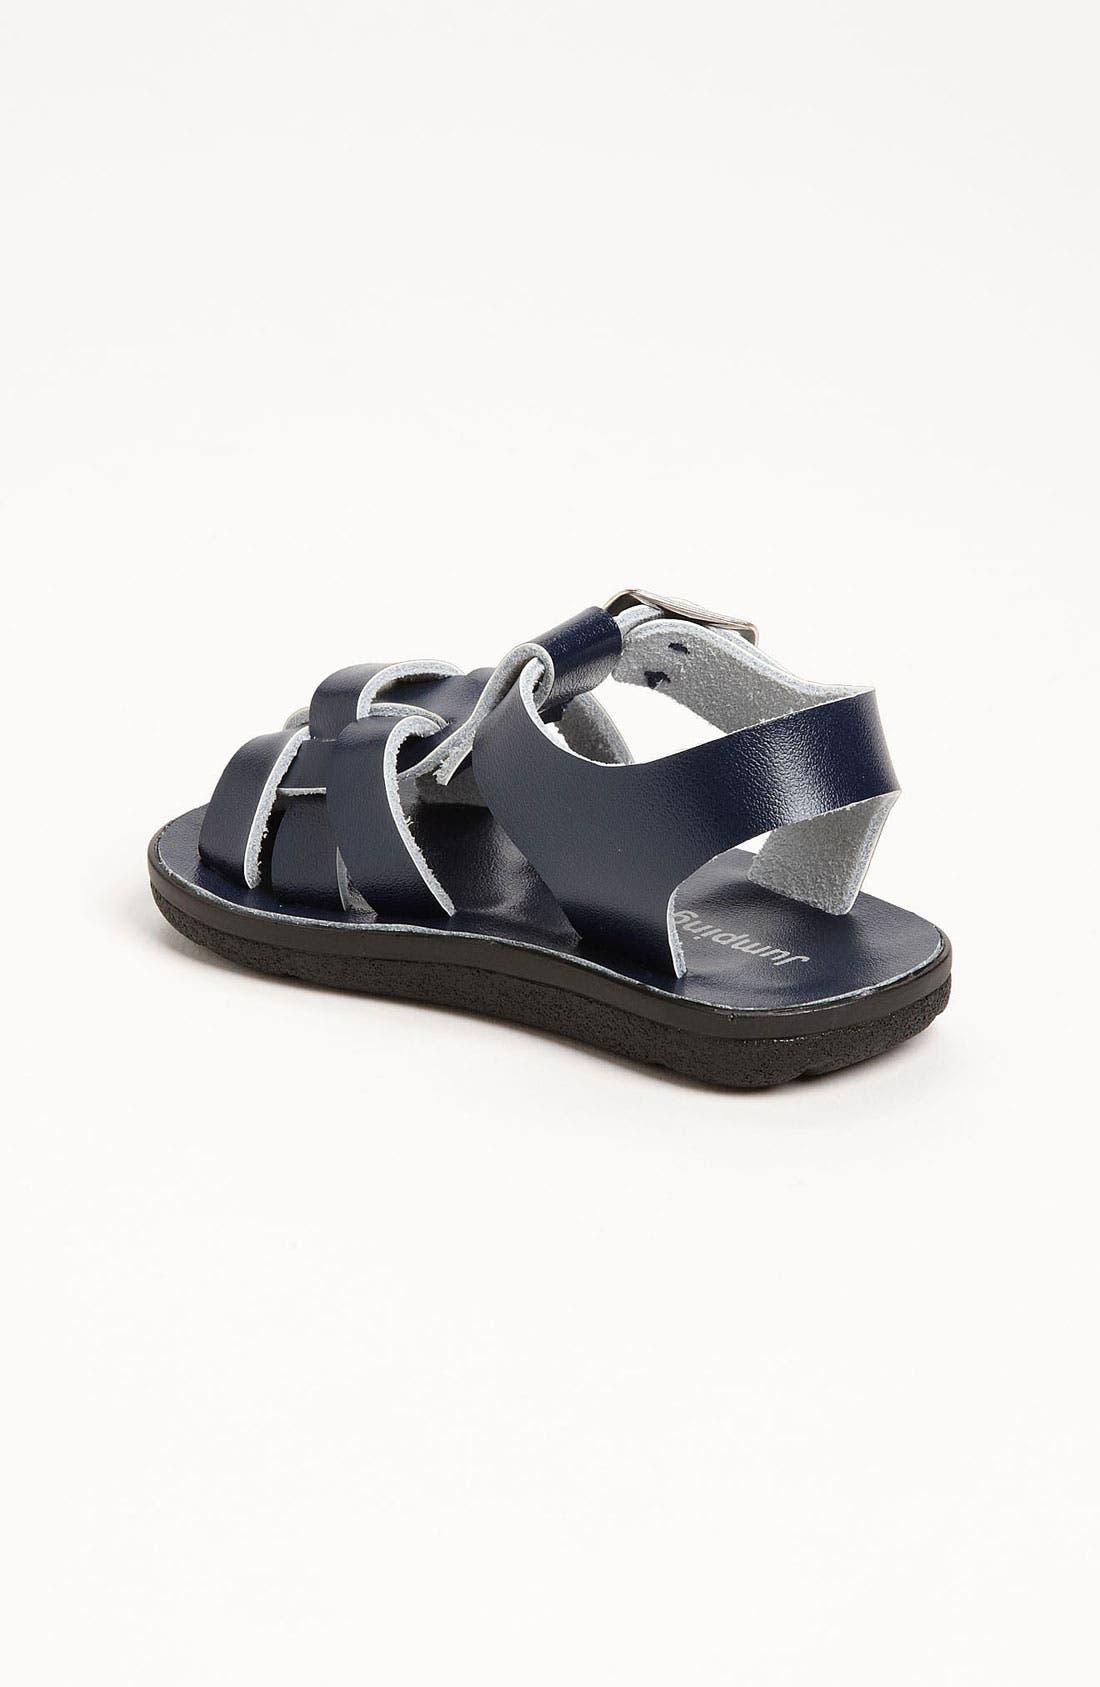 Alternate Image 2  - Jumping Jacks 'Sea Fish' Sandal (Walker & Toddler)